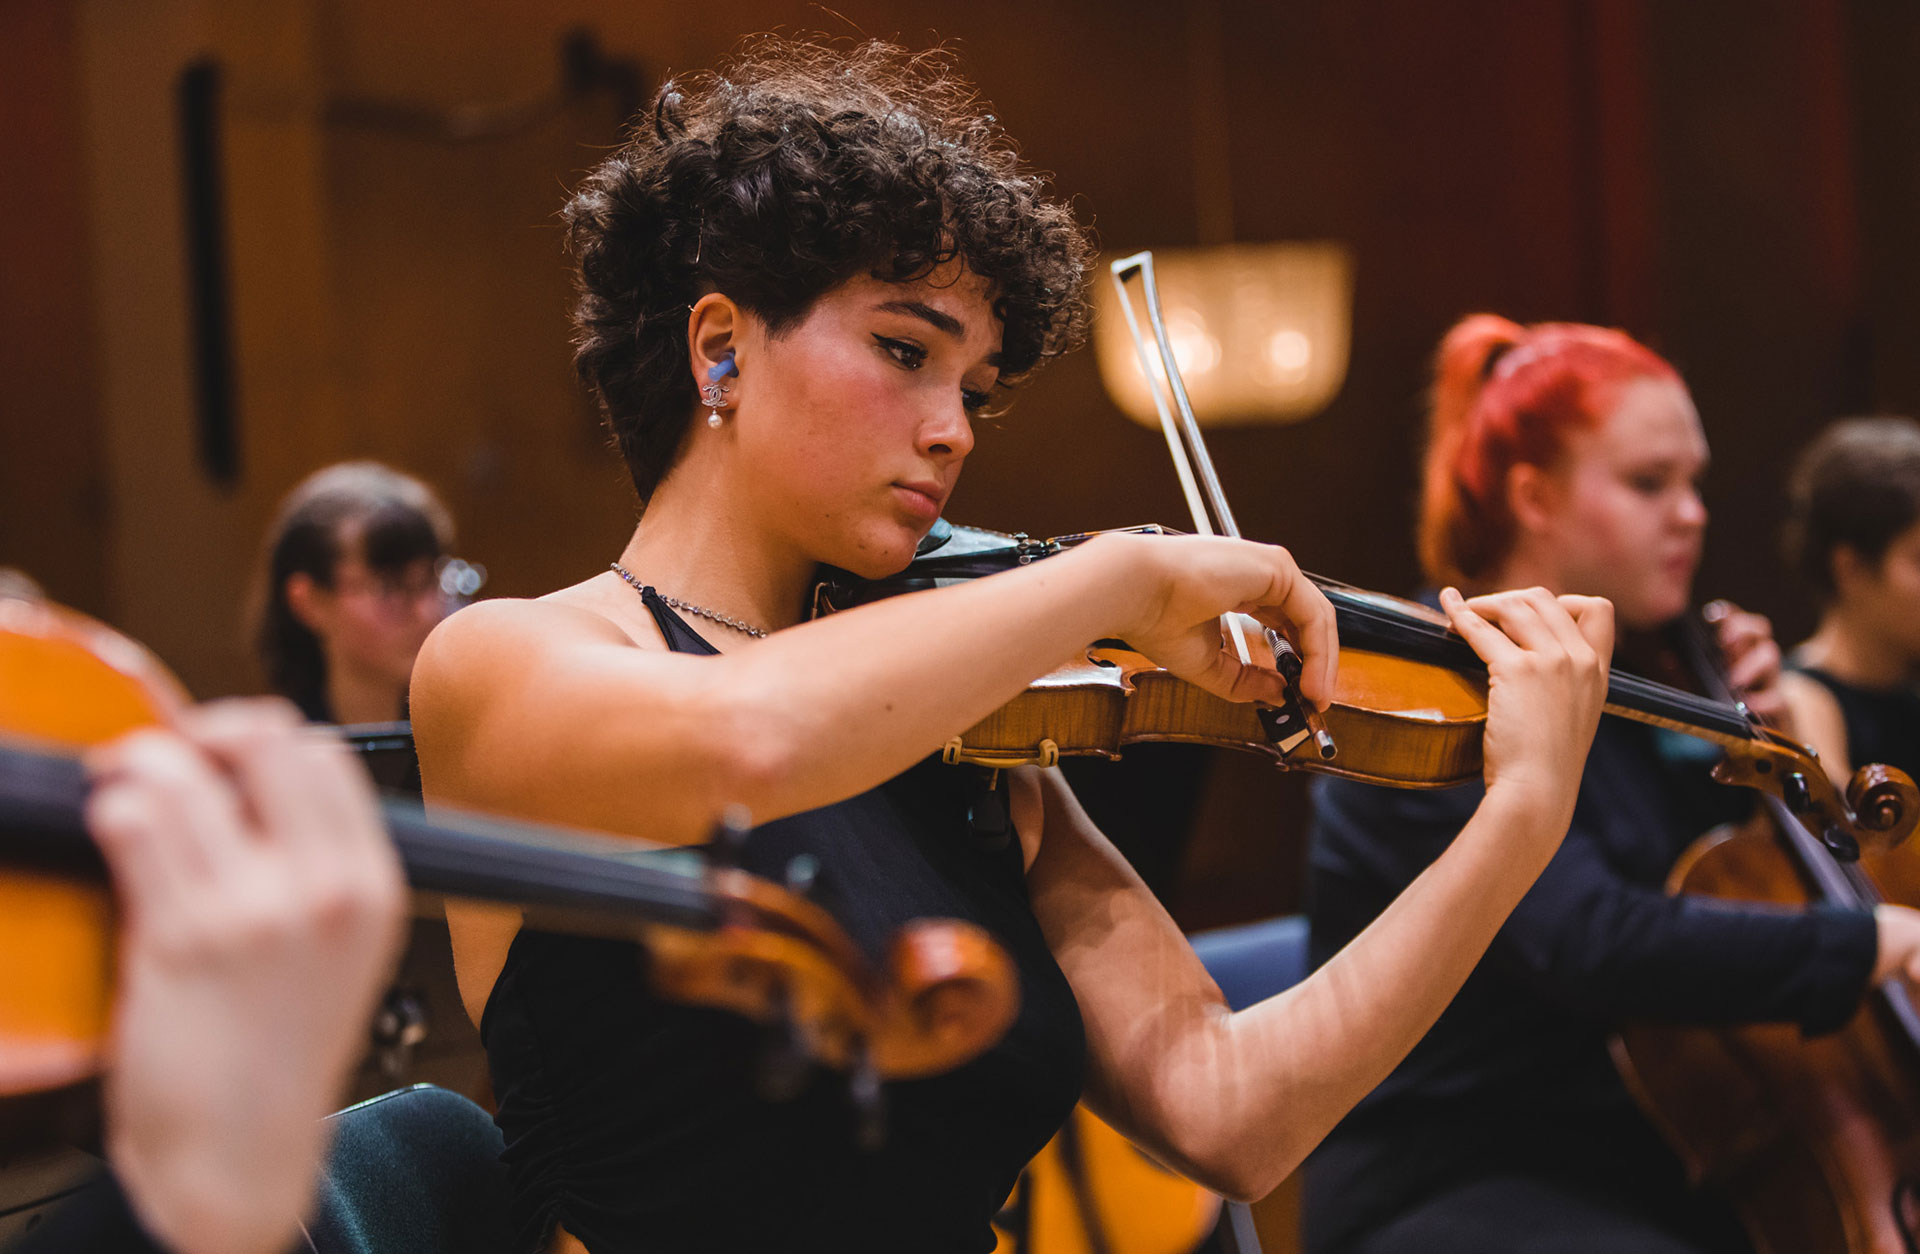 Ung tjej spelar fiol. Fotograf Francis Löfvenholm